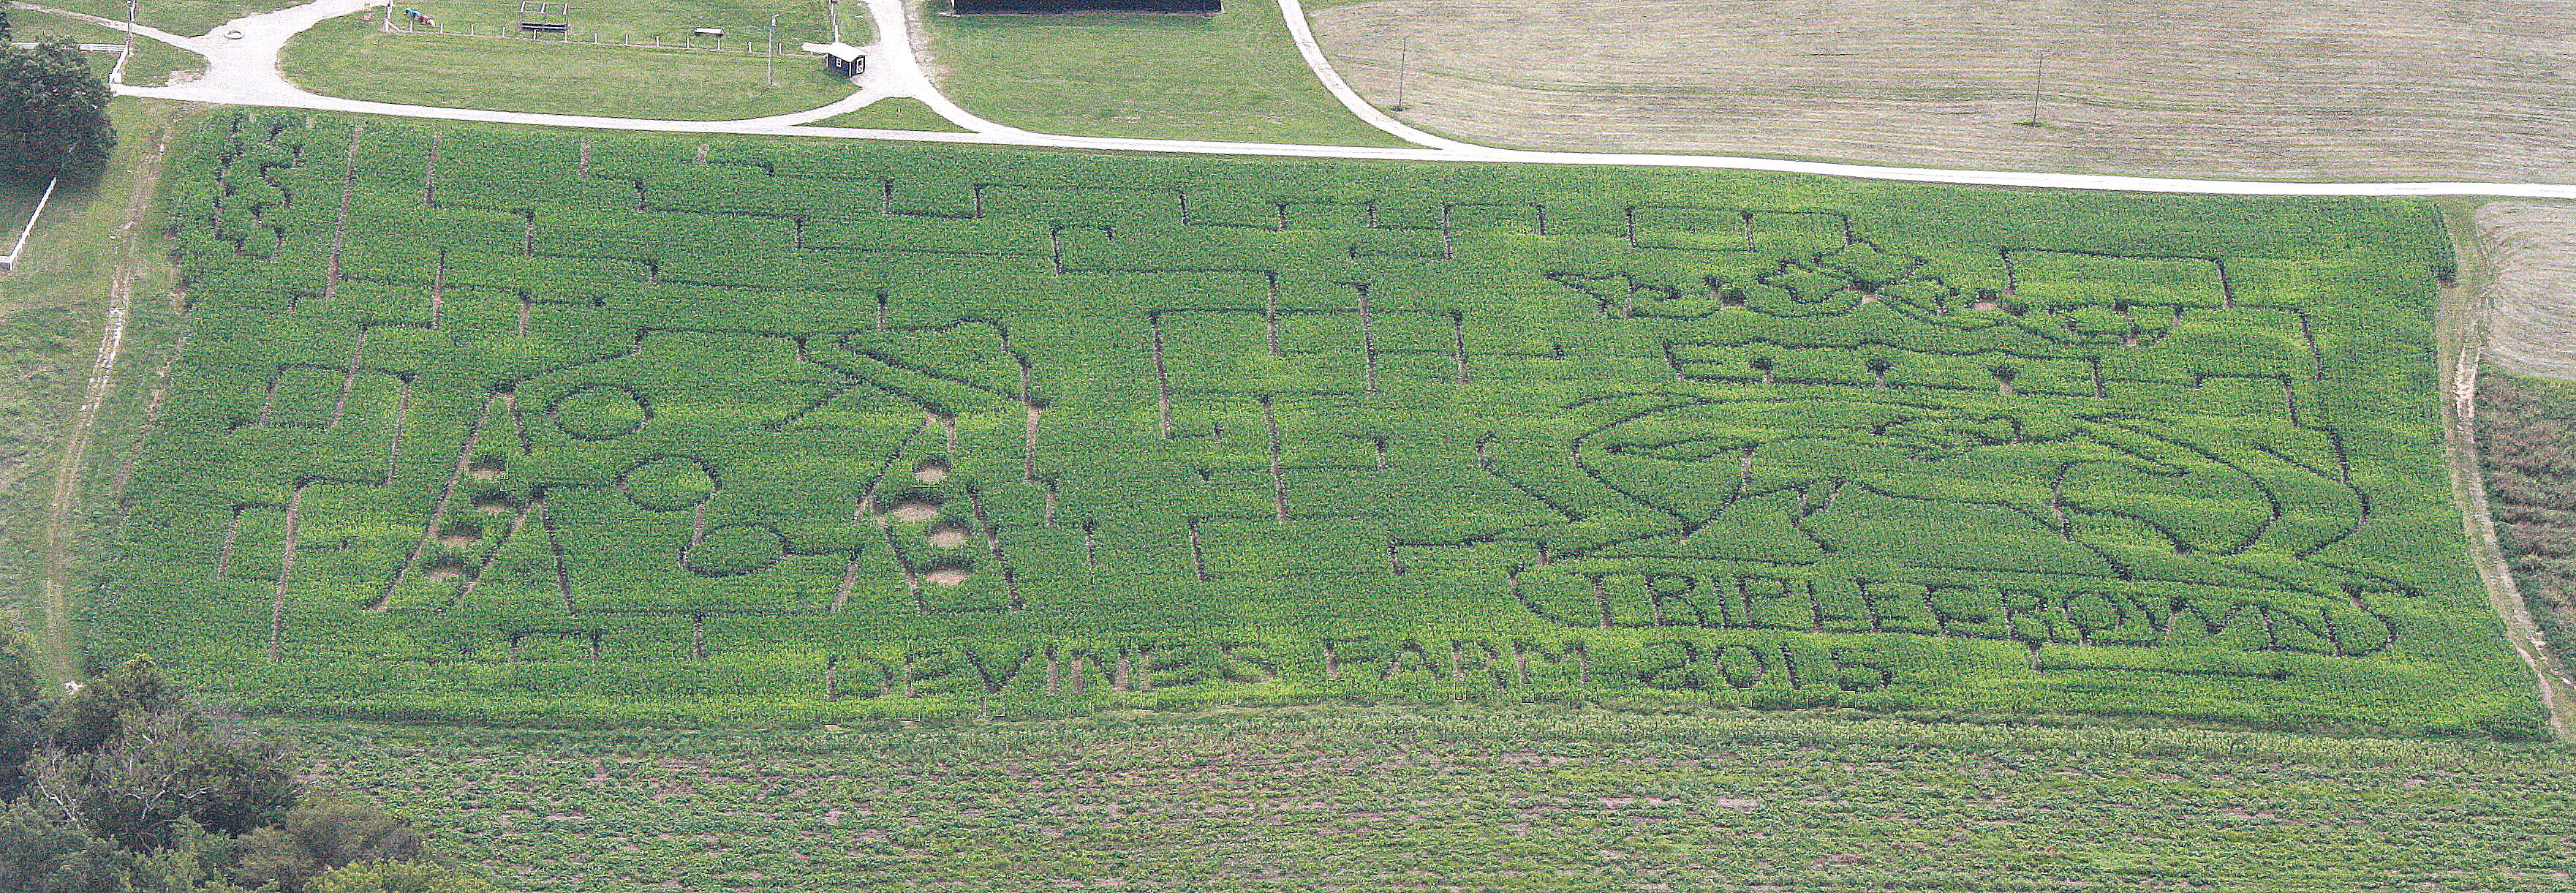 2015 Devine's Corn Maze Design R0 8-14-15.jpg